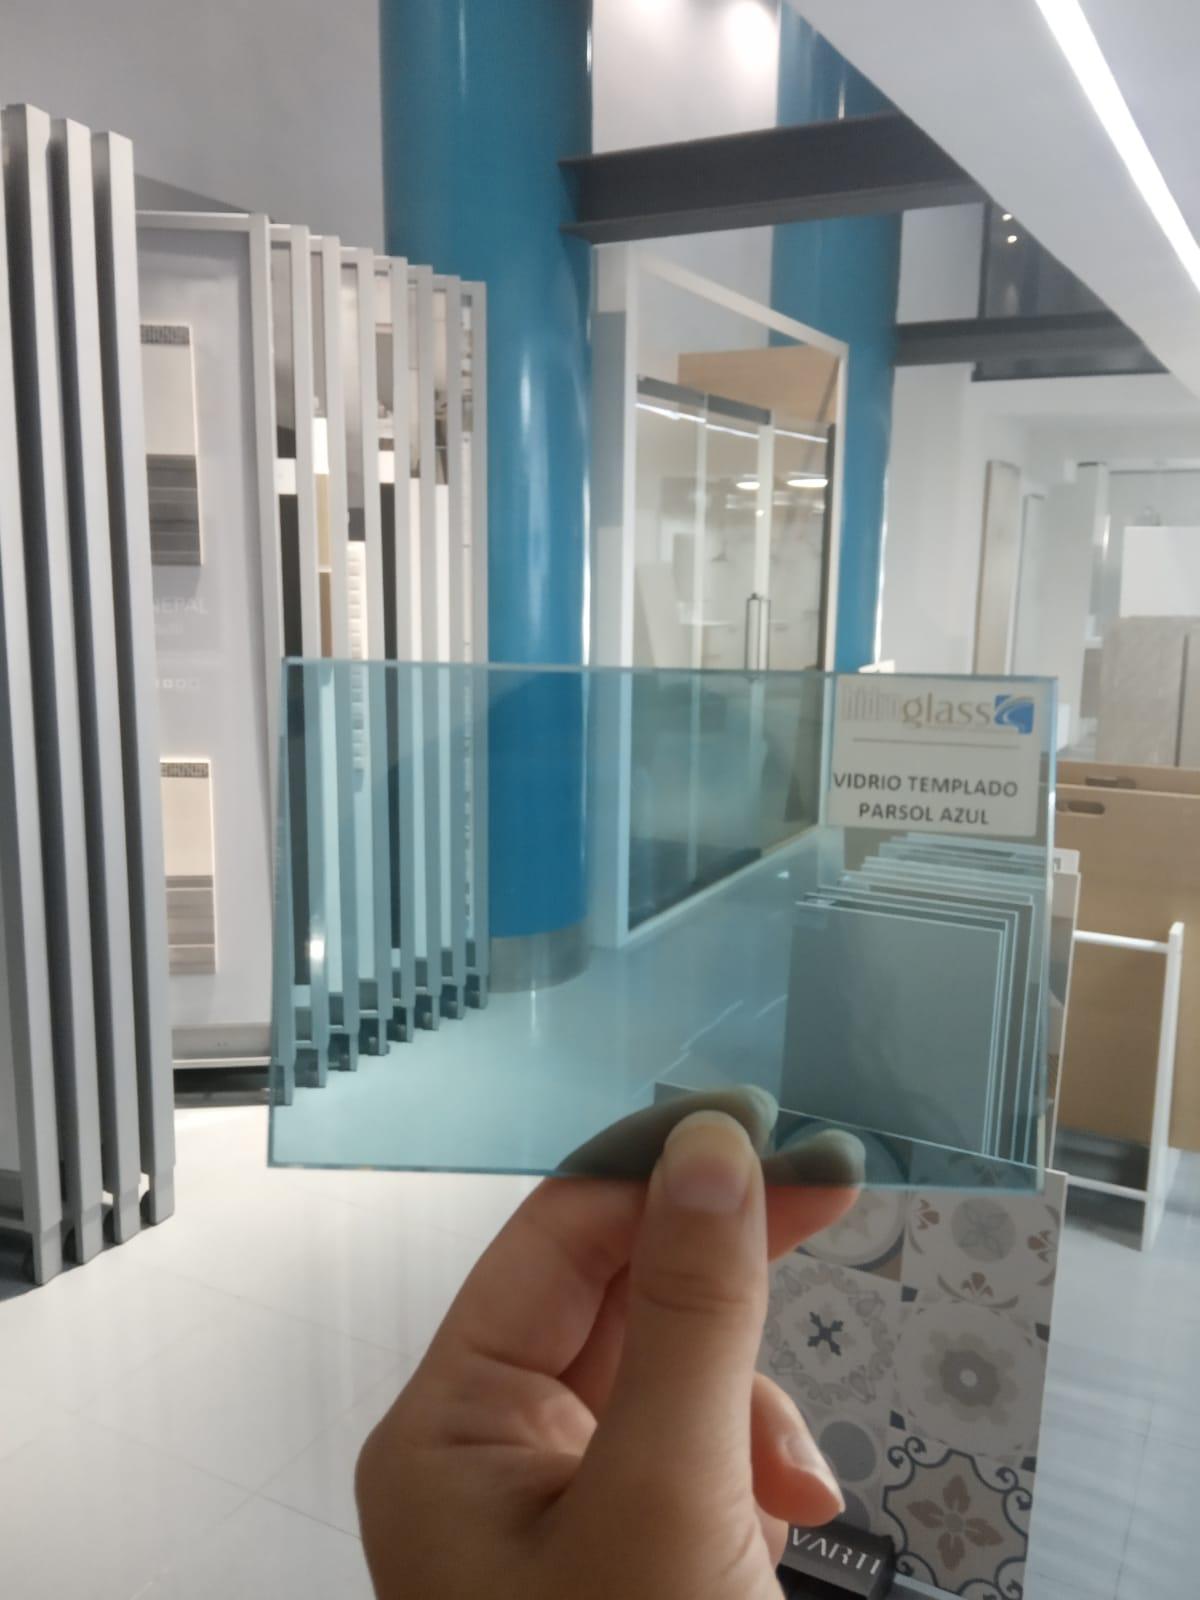 Vidrio Templado Parsol Azul